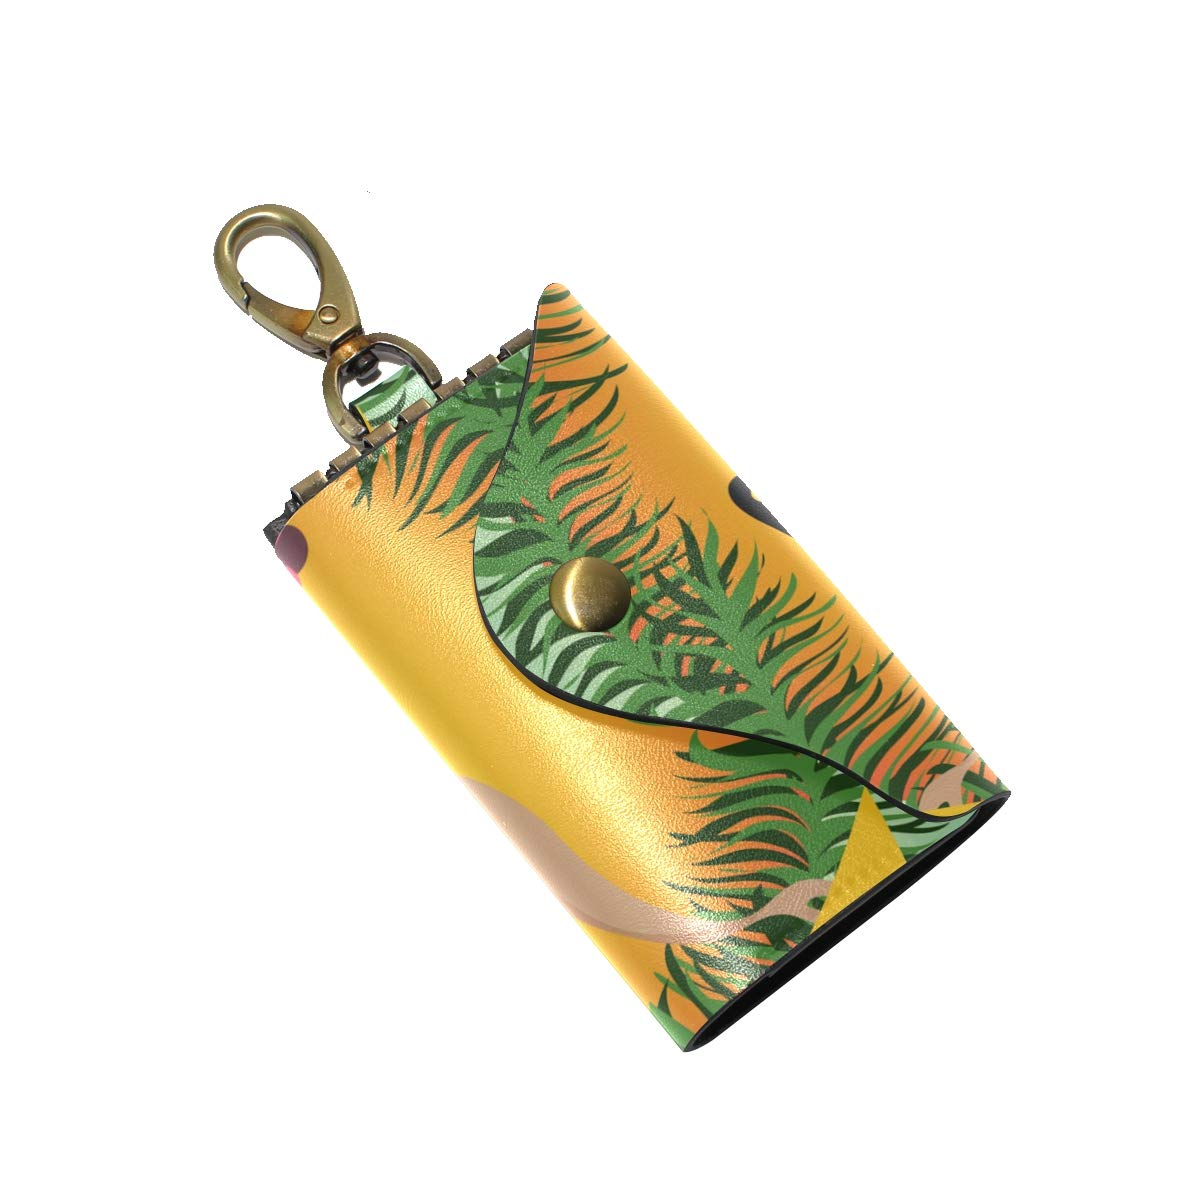 KEAKIA Hawaiian Aloha Hula Dancing Girl Leather Key Case Wallets Tri-fold Key Holder Keychains with 6 Hooks 2 Slot Snap Closure for Men Women